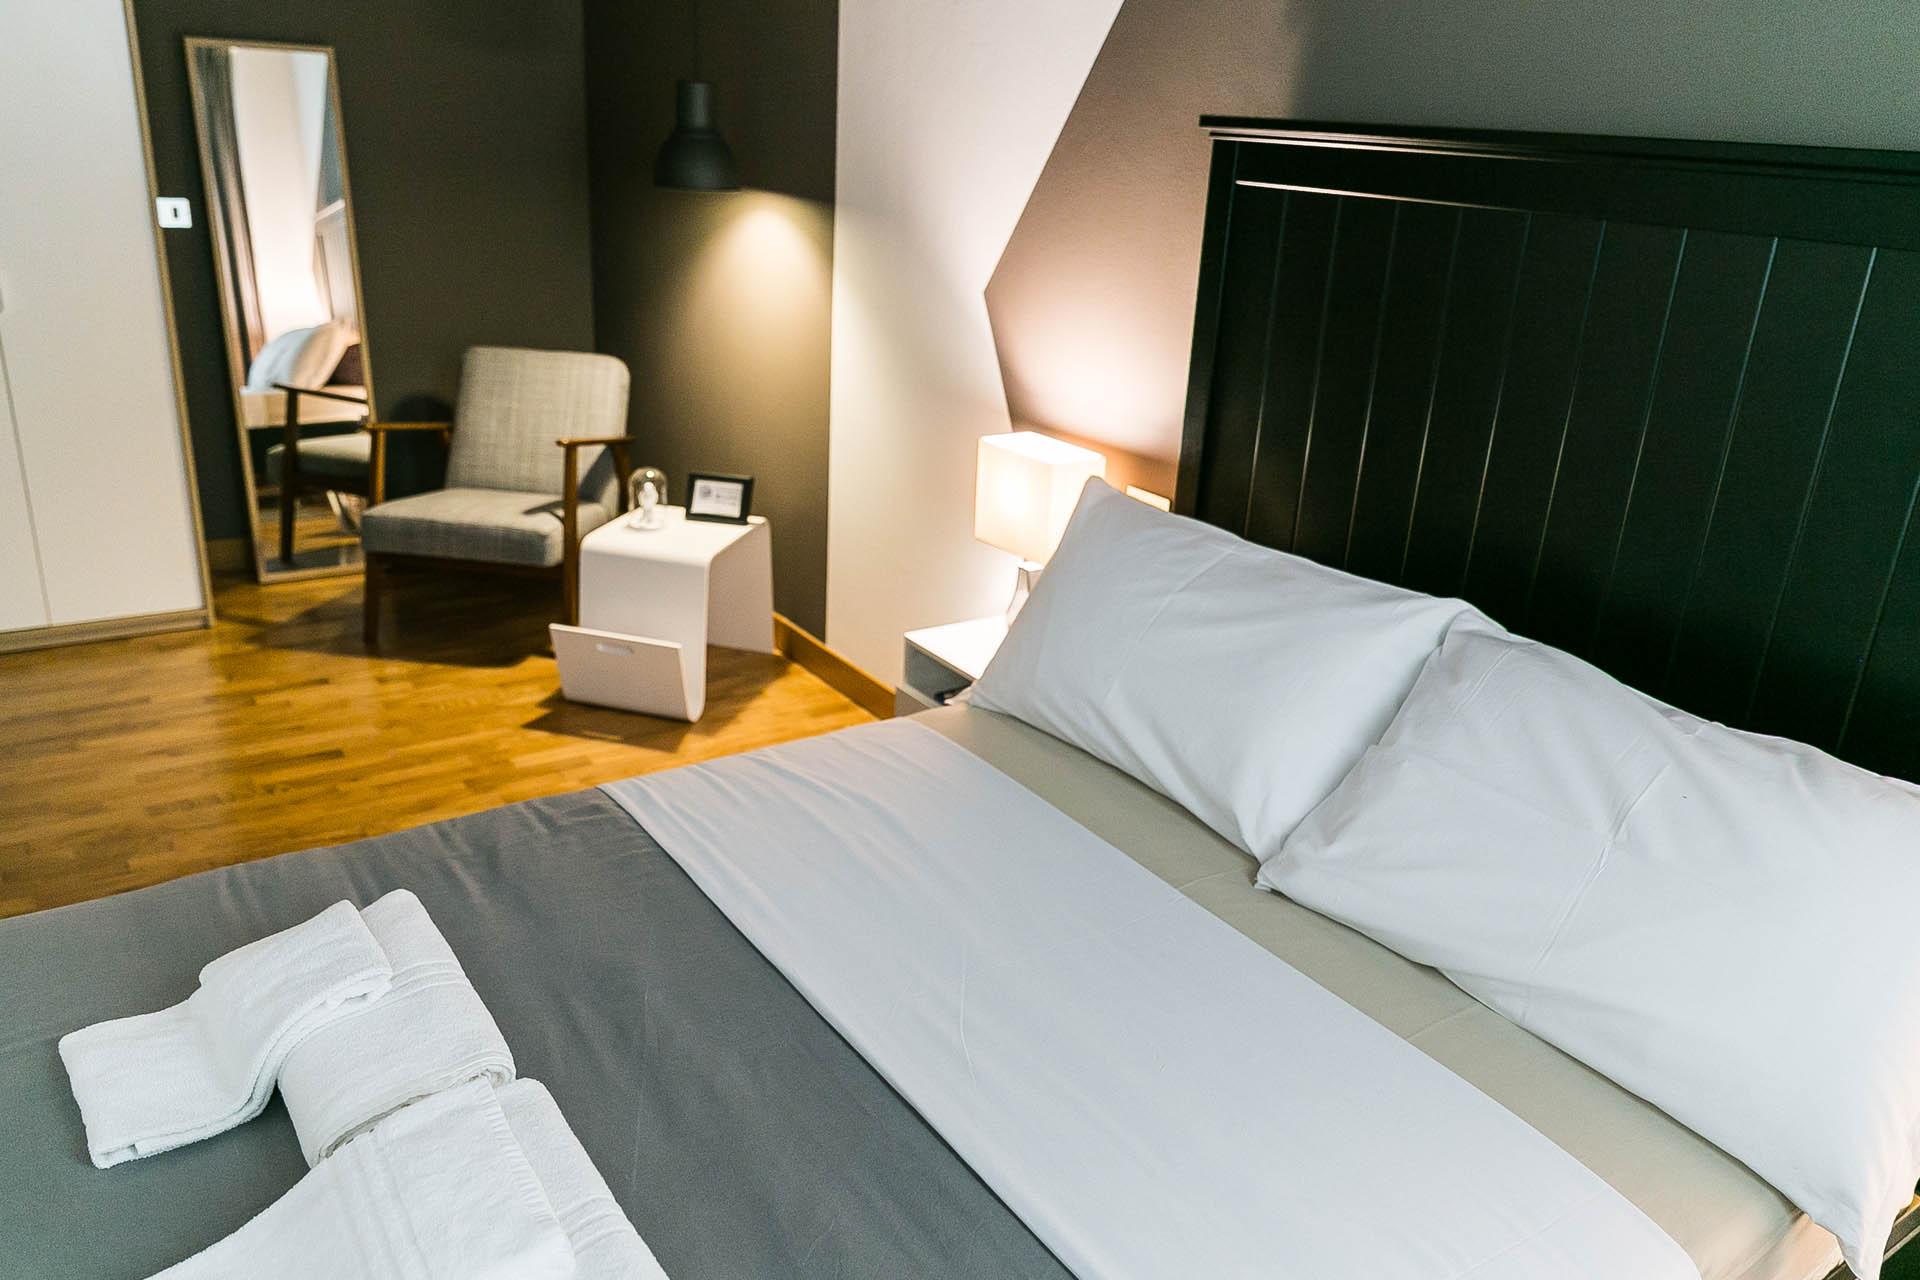 Suite Castelmenardo 39 Treviso